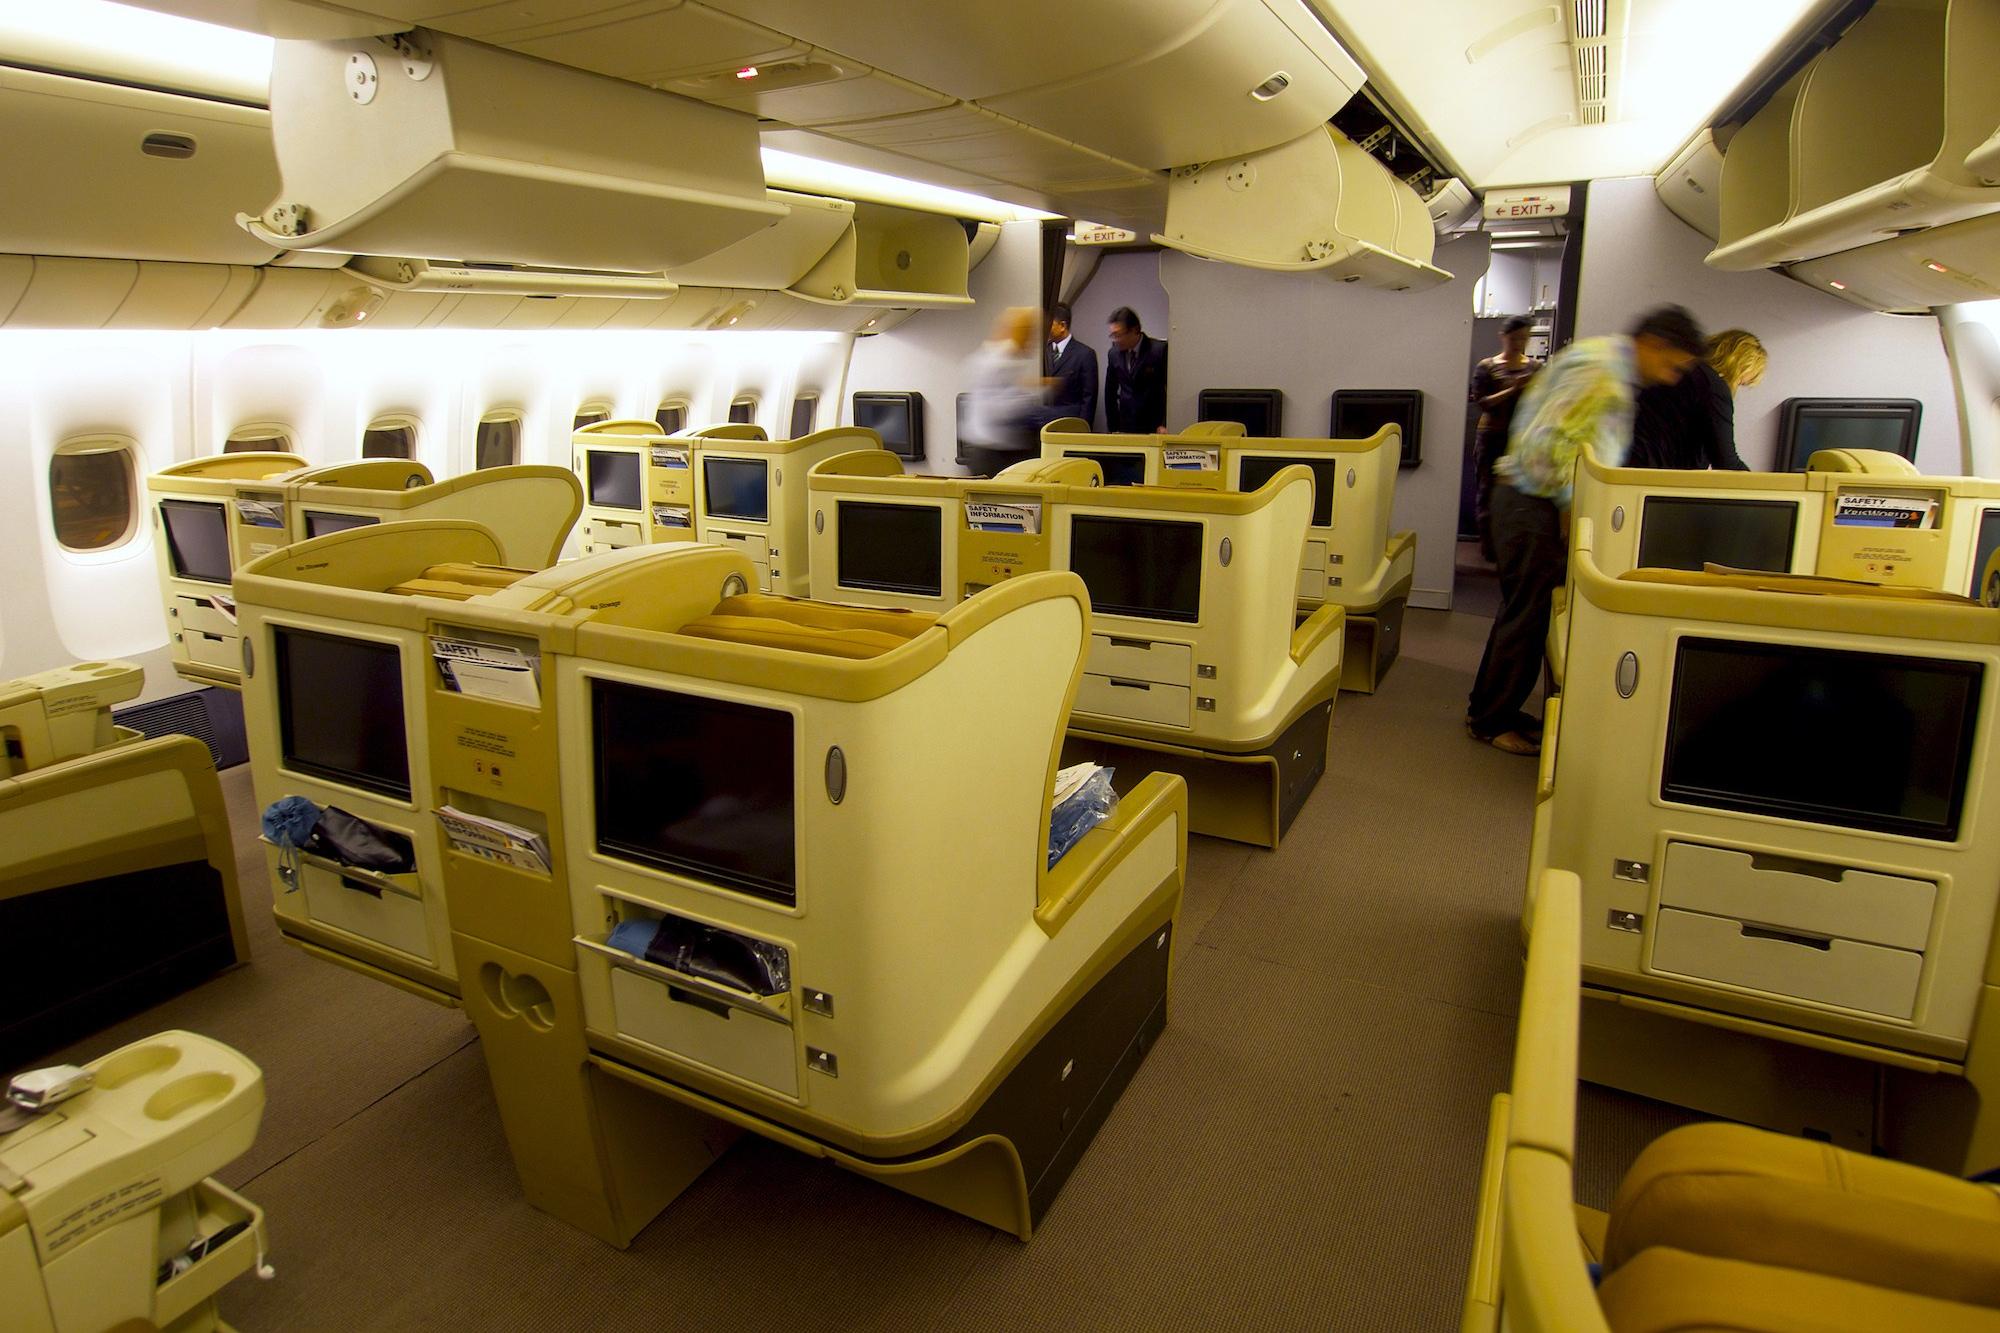 SQ-777-200-Regional-Biz-2-Edwin-Leong.jpg